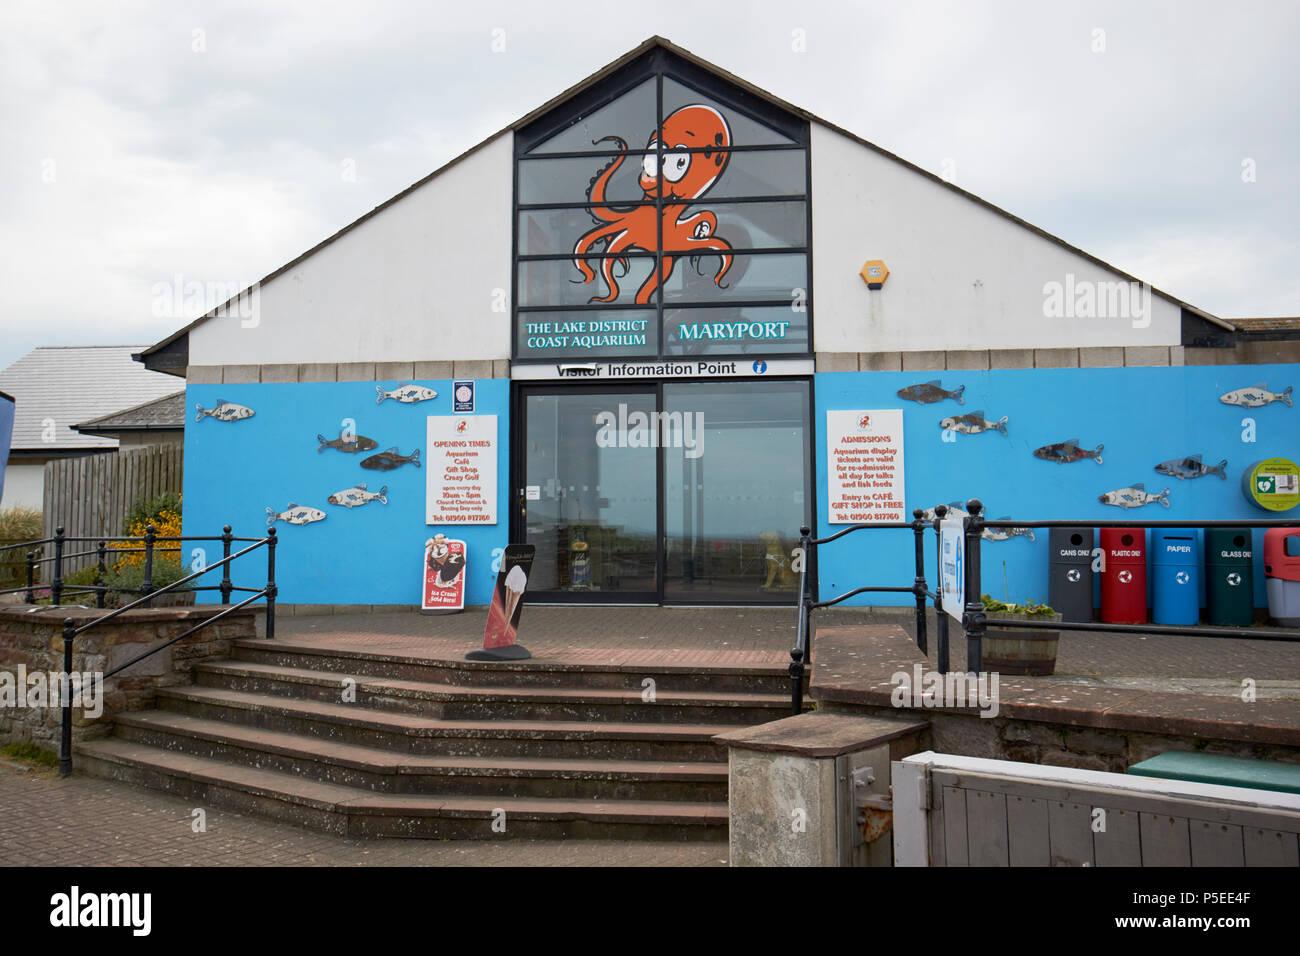 The lake district coast aquarium Maryport Cumbria England UK - Stock Image